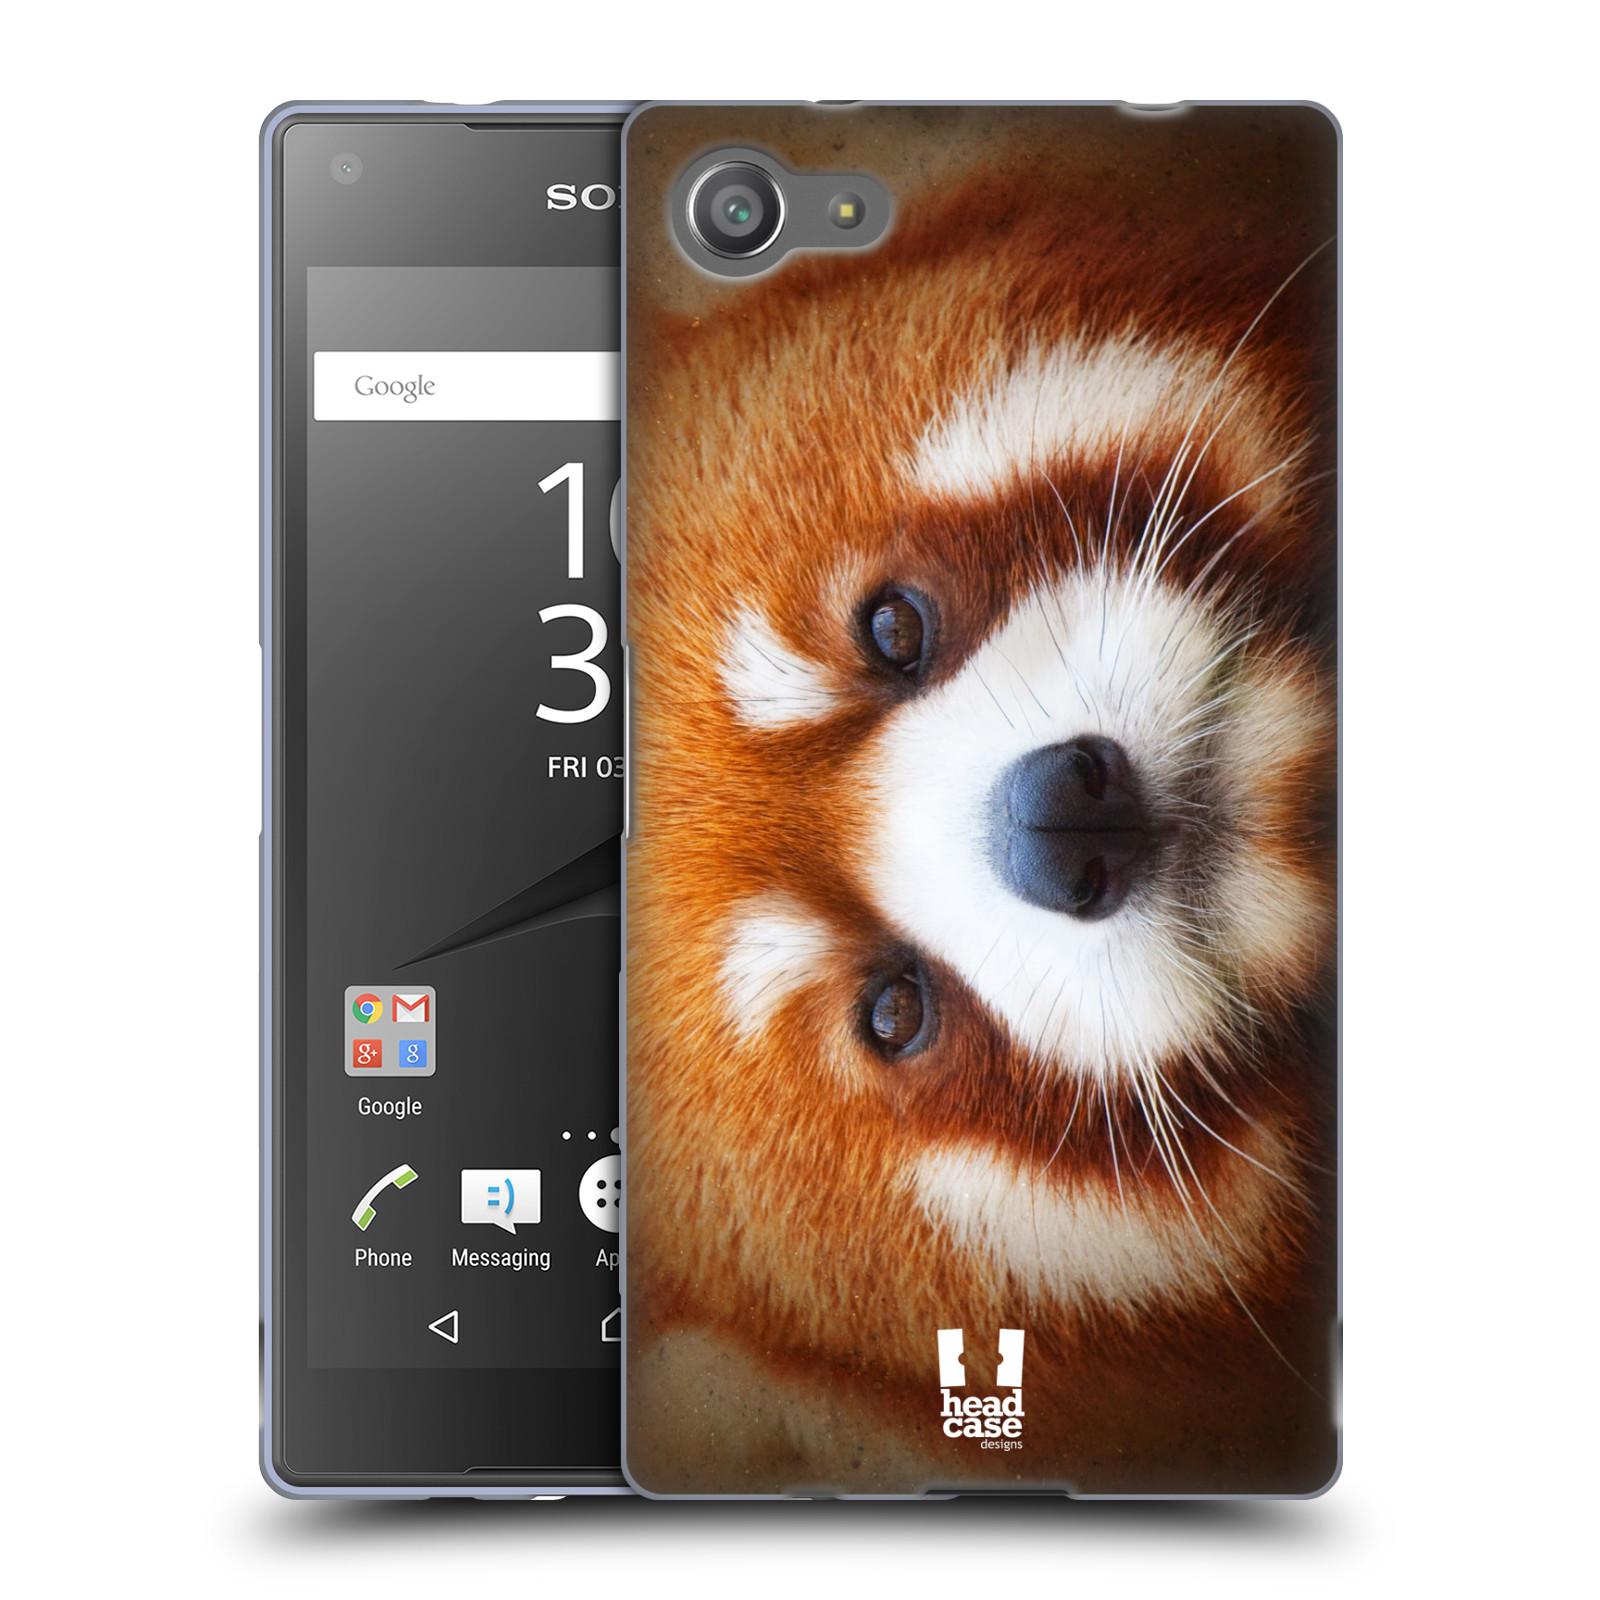 HEAD CASE silikonový obal na mobil Sony Xperia Z5 COMPACT vzor Zvířecí tváře 2 medvěd panda rudá